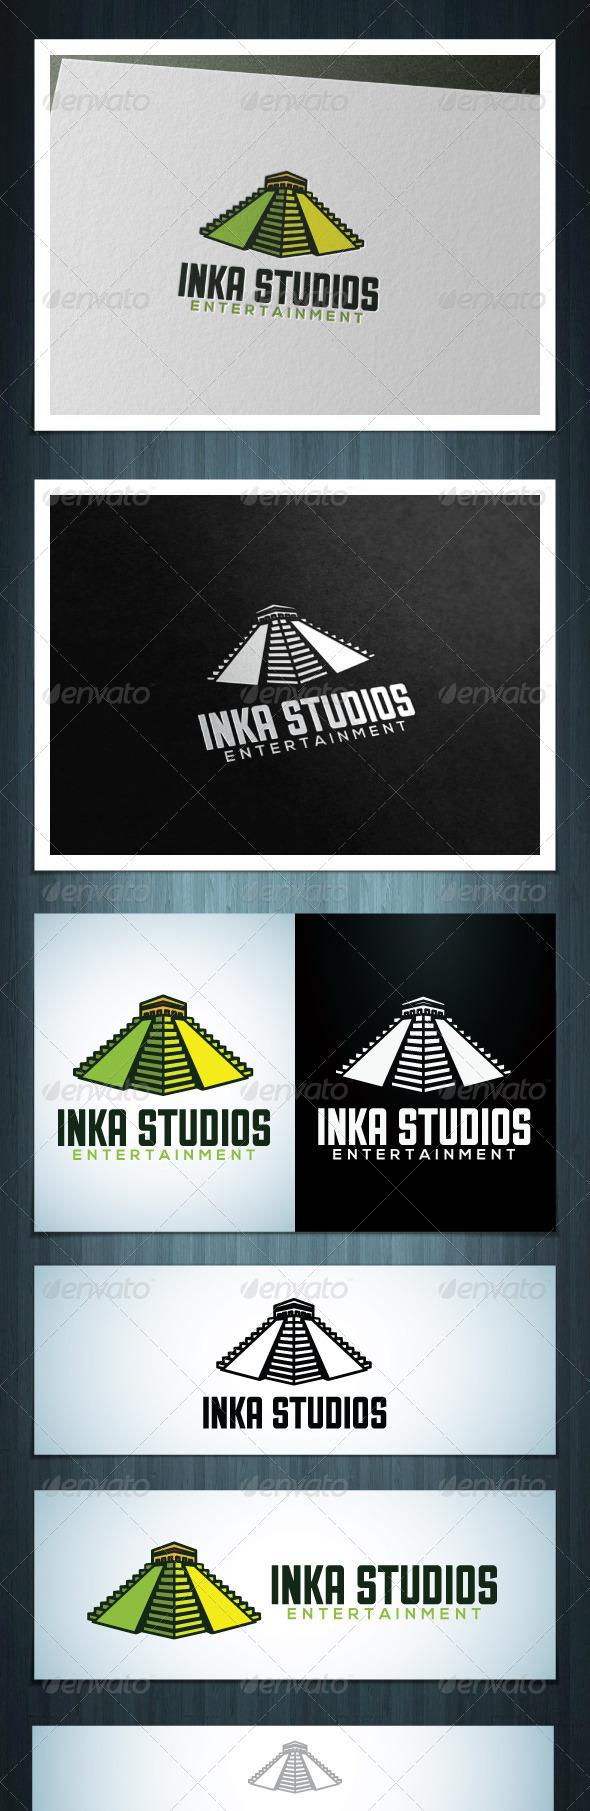 Inka Studios 2